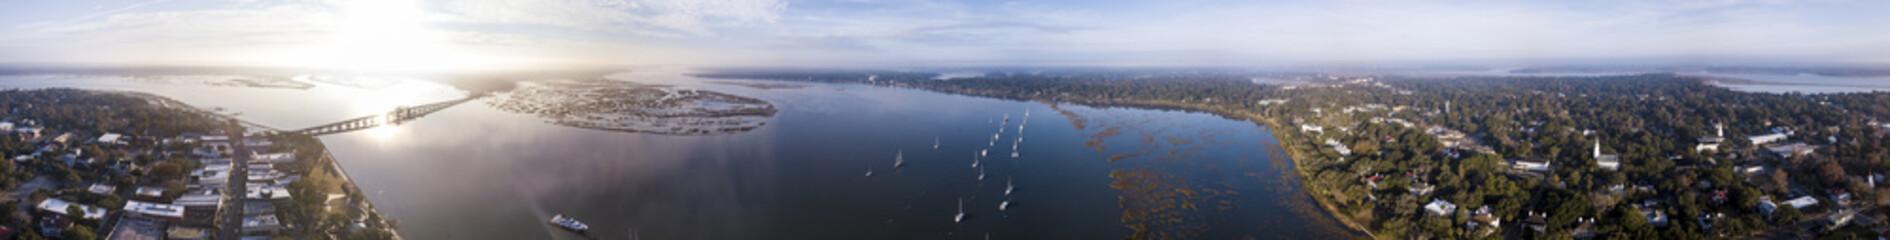 Aerial 360 degree panorama of Beaufort, South Carolina, USA.